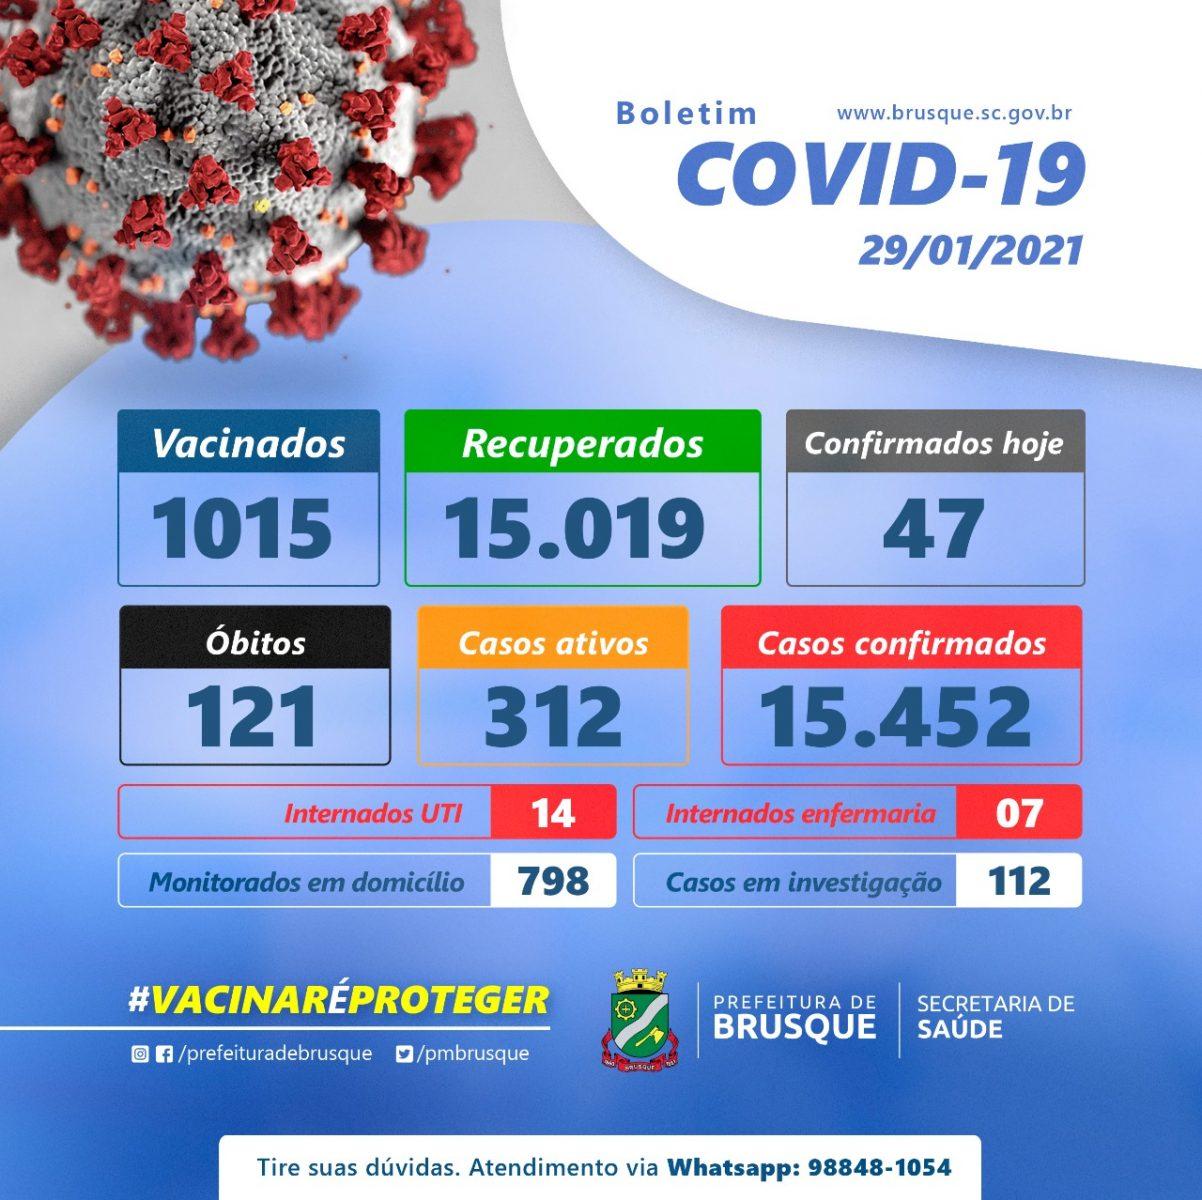 Covid-19: Confira o boletim epidemiológico desta sexta-feira (29)